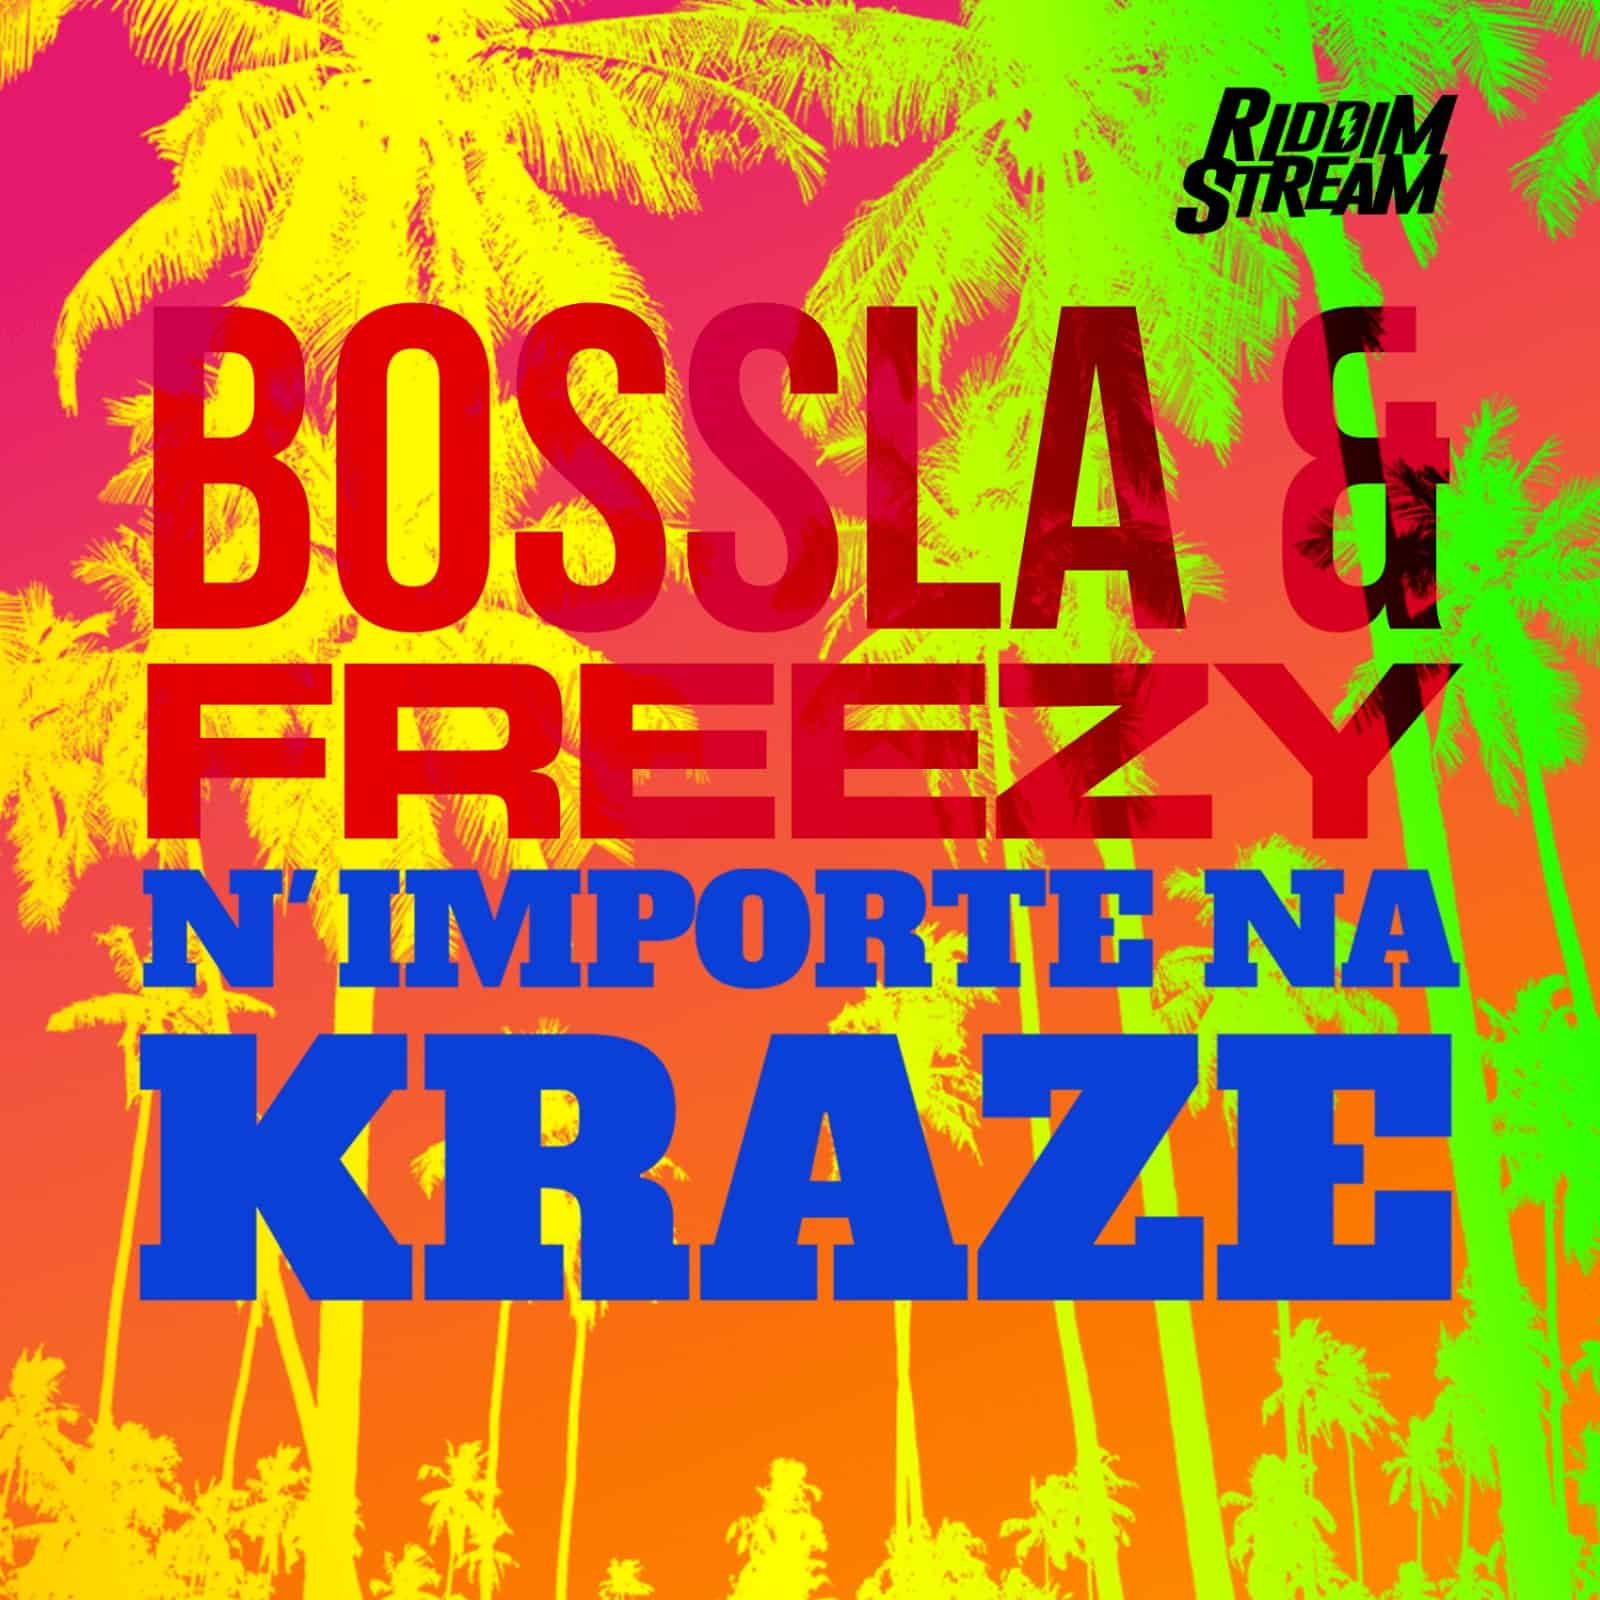 Bossla X Freezy - N